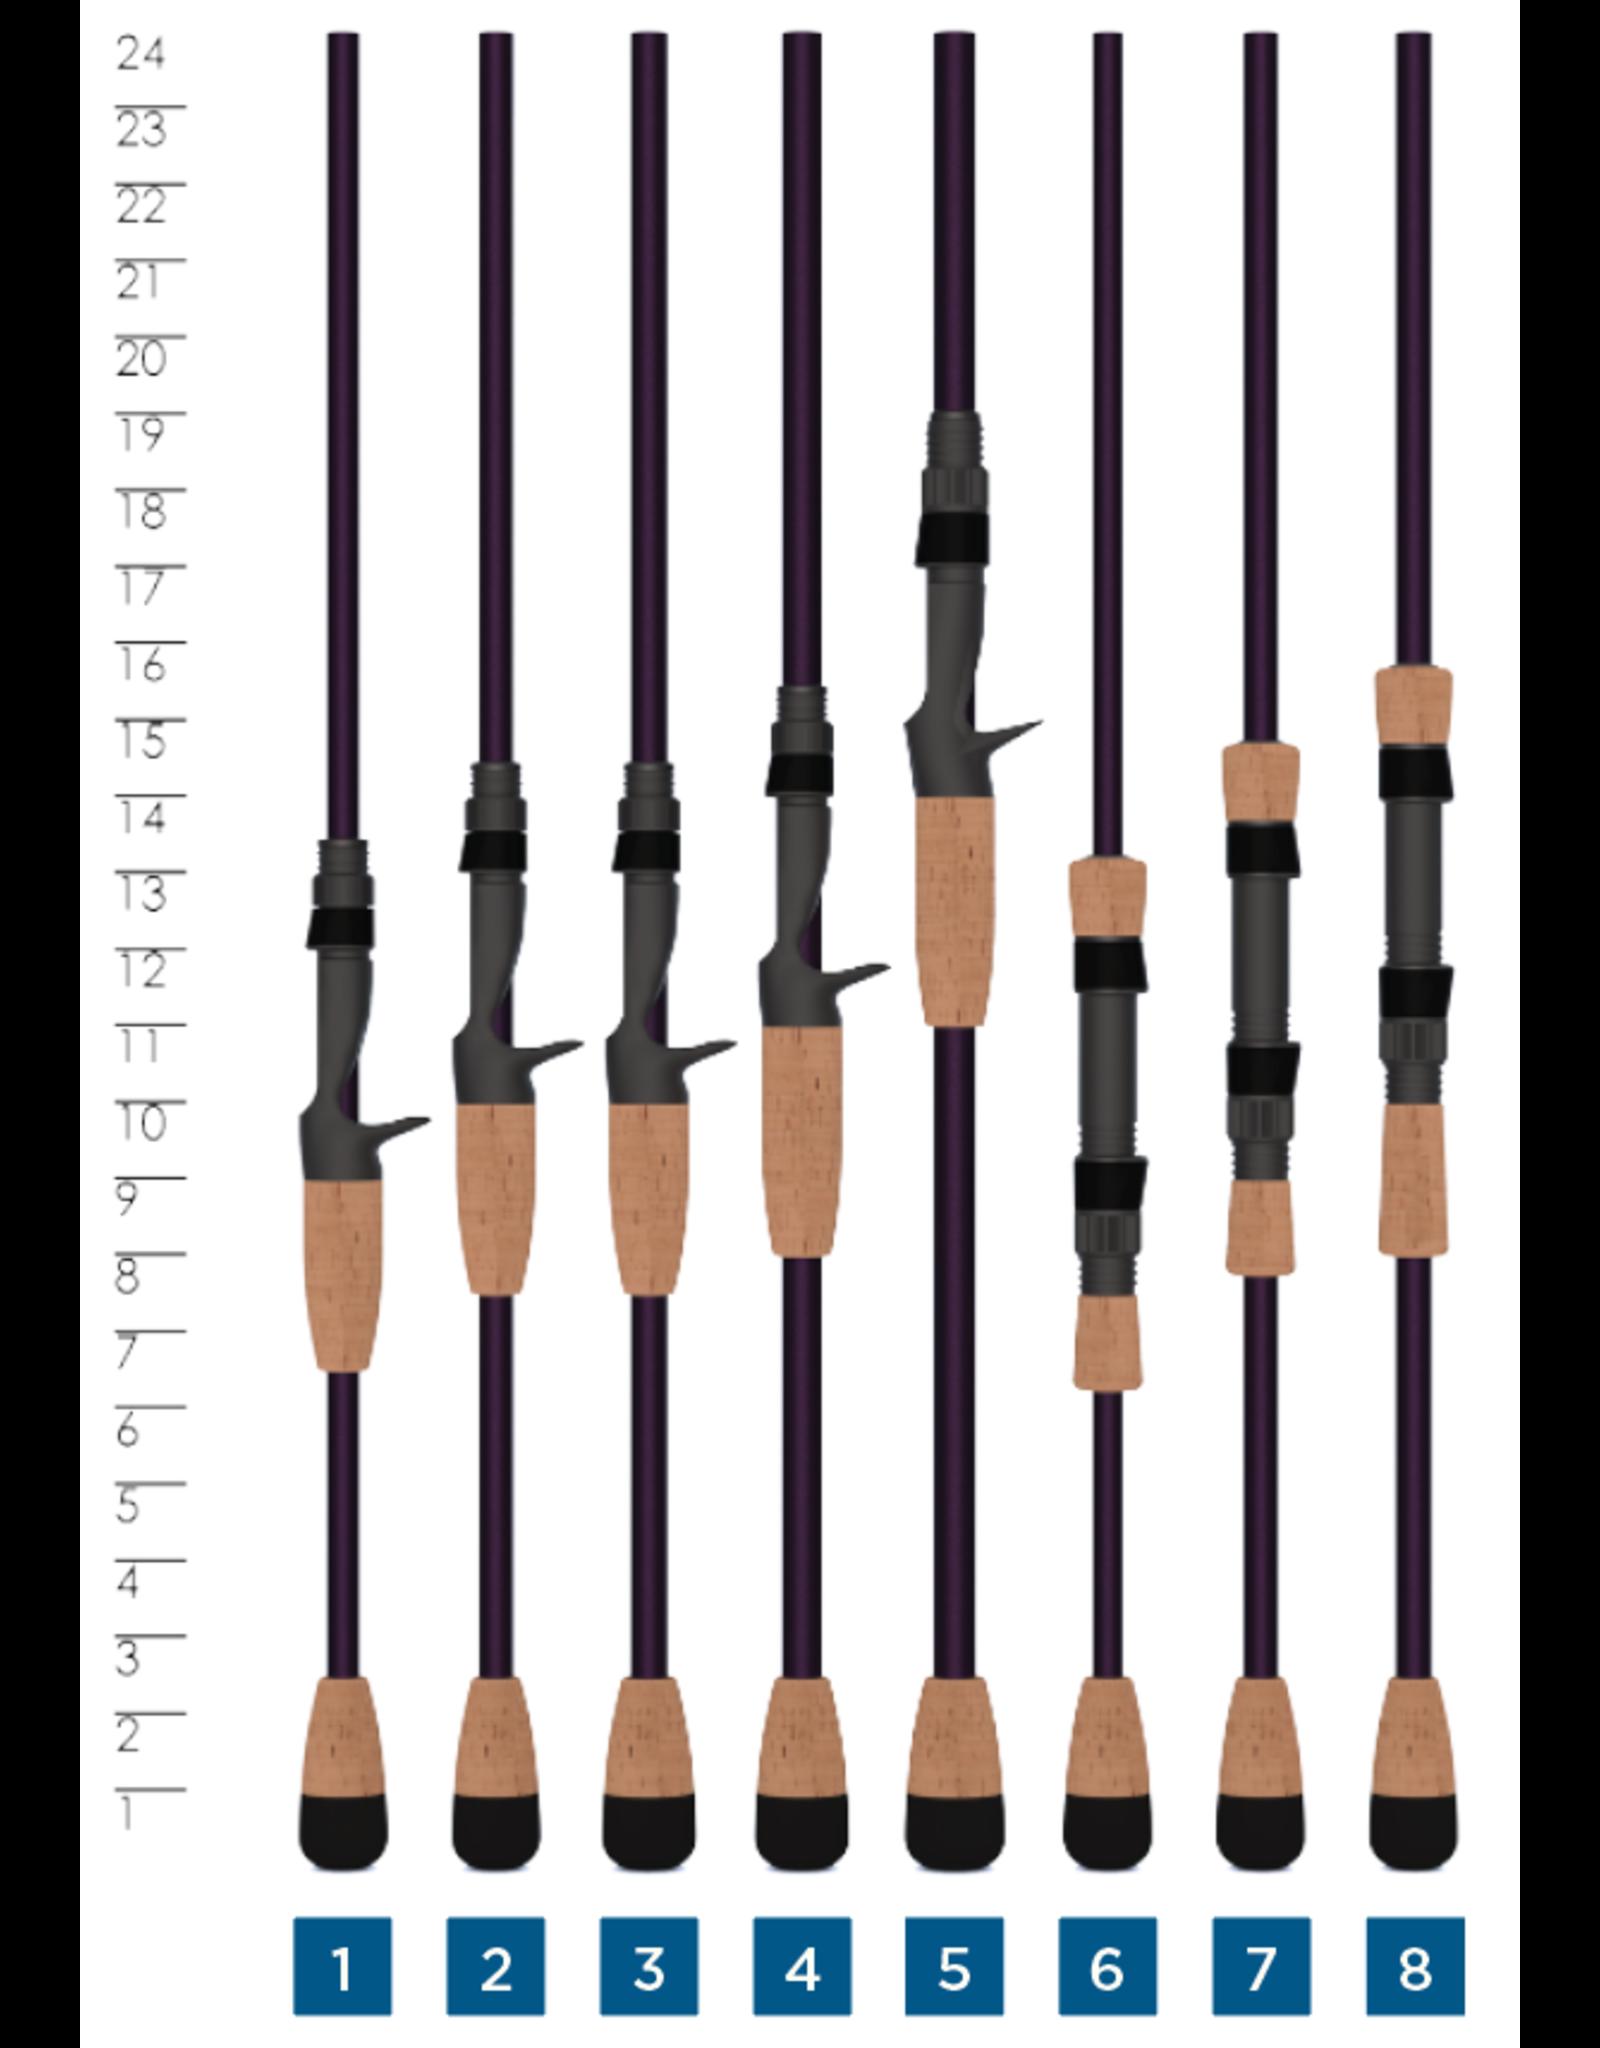 St. Croix St. Croix Mojo Bass Casting Rod